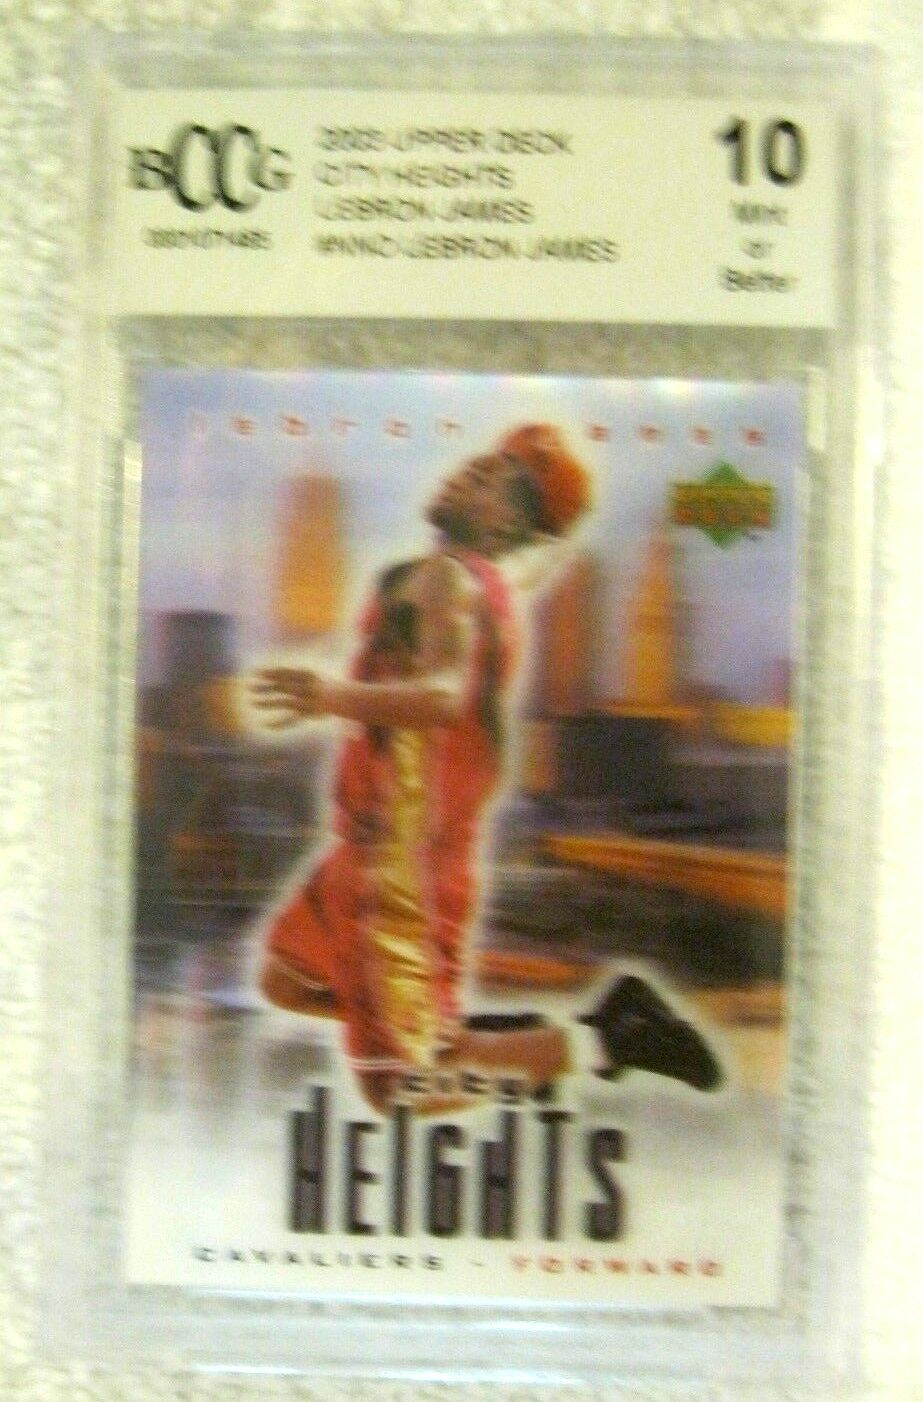 Lebron James RC 2004 Fleer USA Rookie Card GEM BGS 9.5! Cavaliers RC image 6